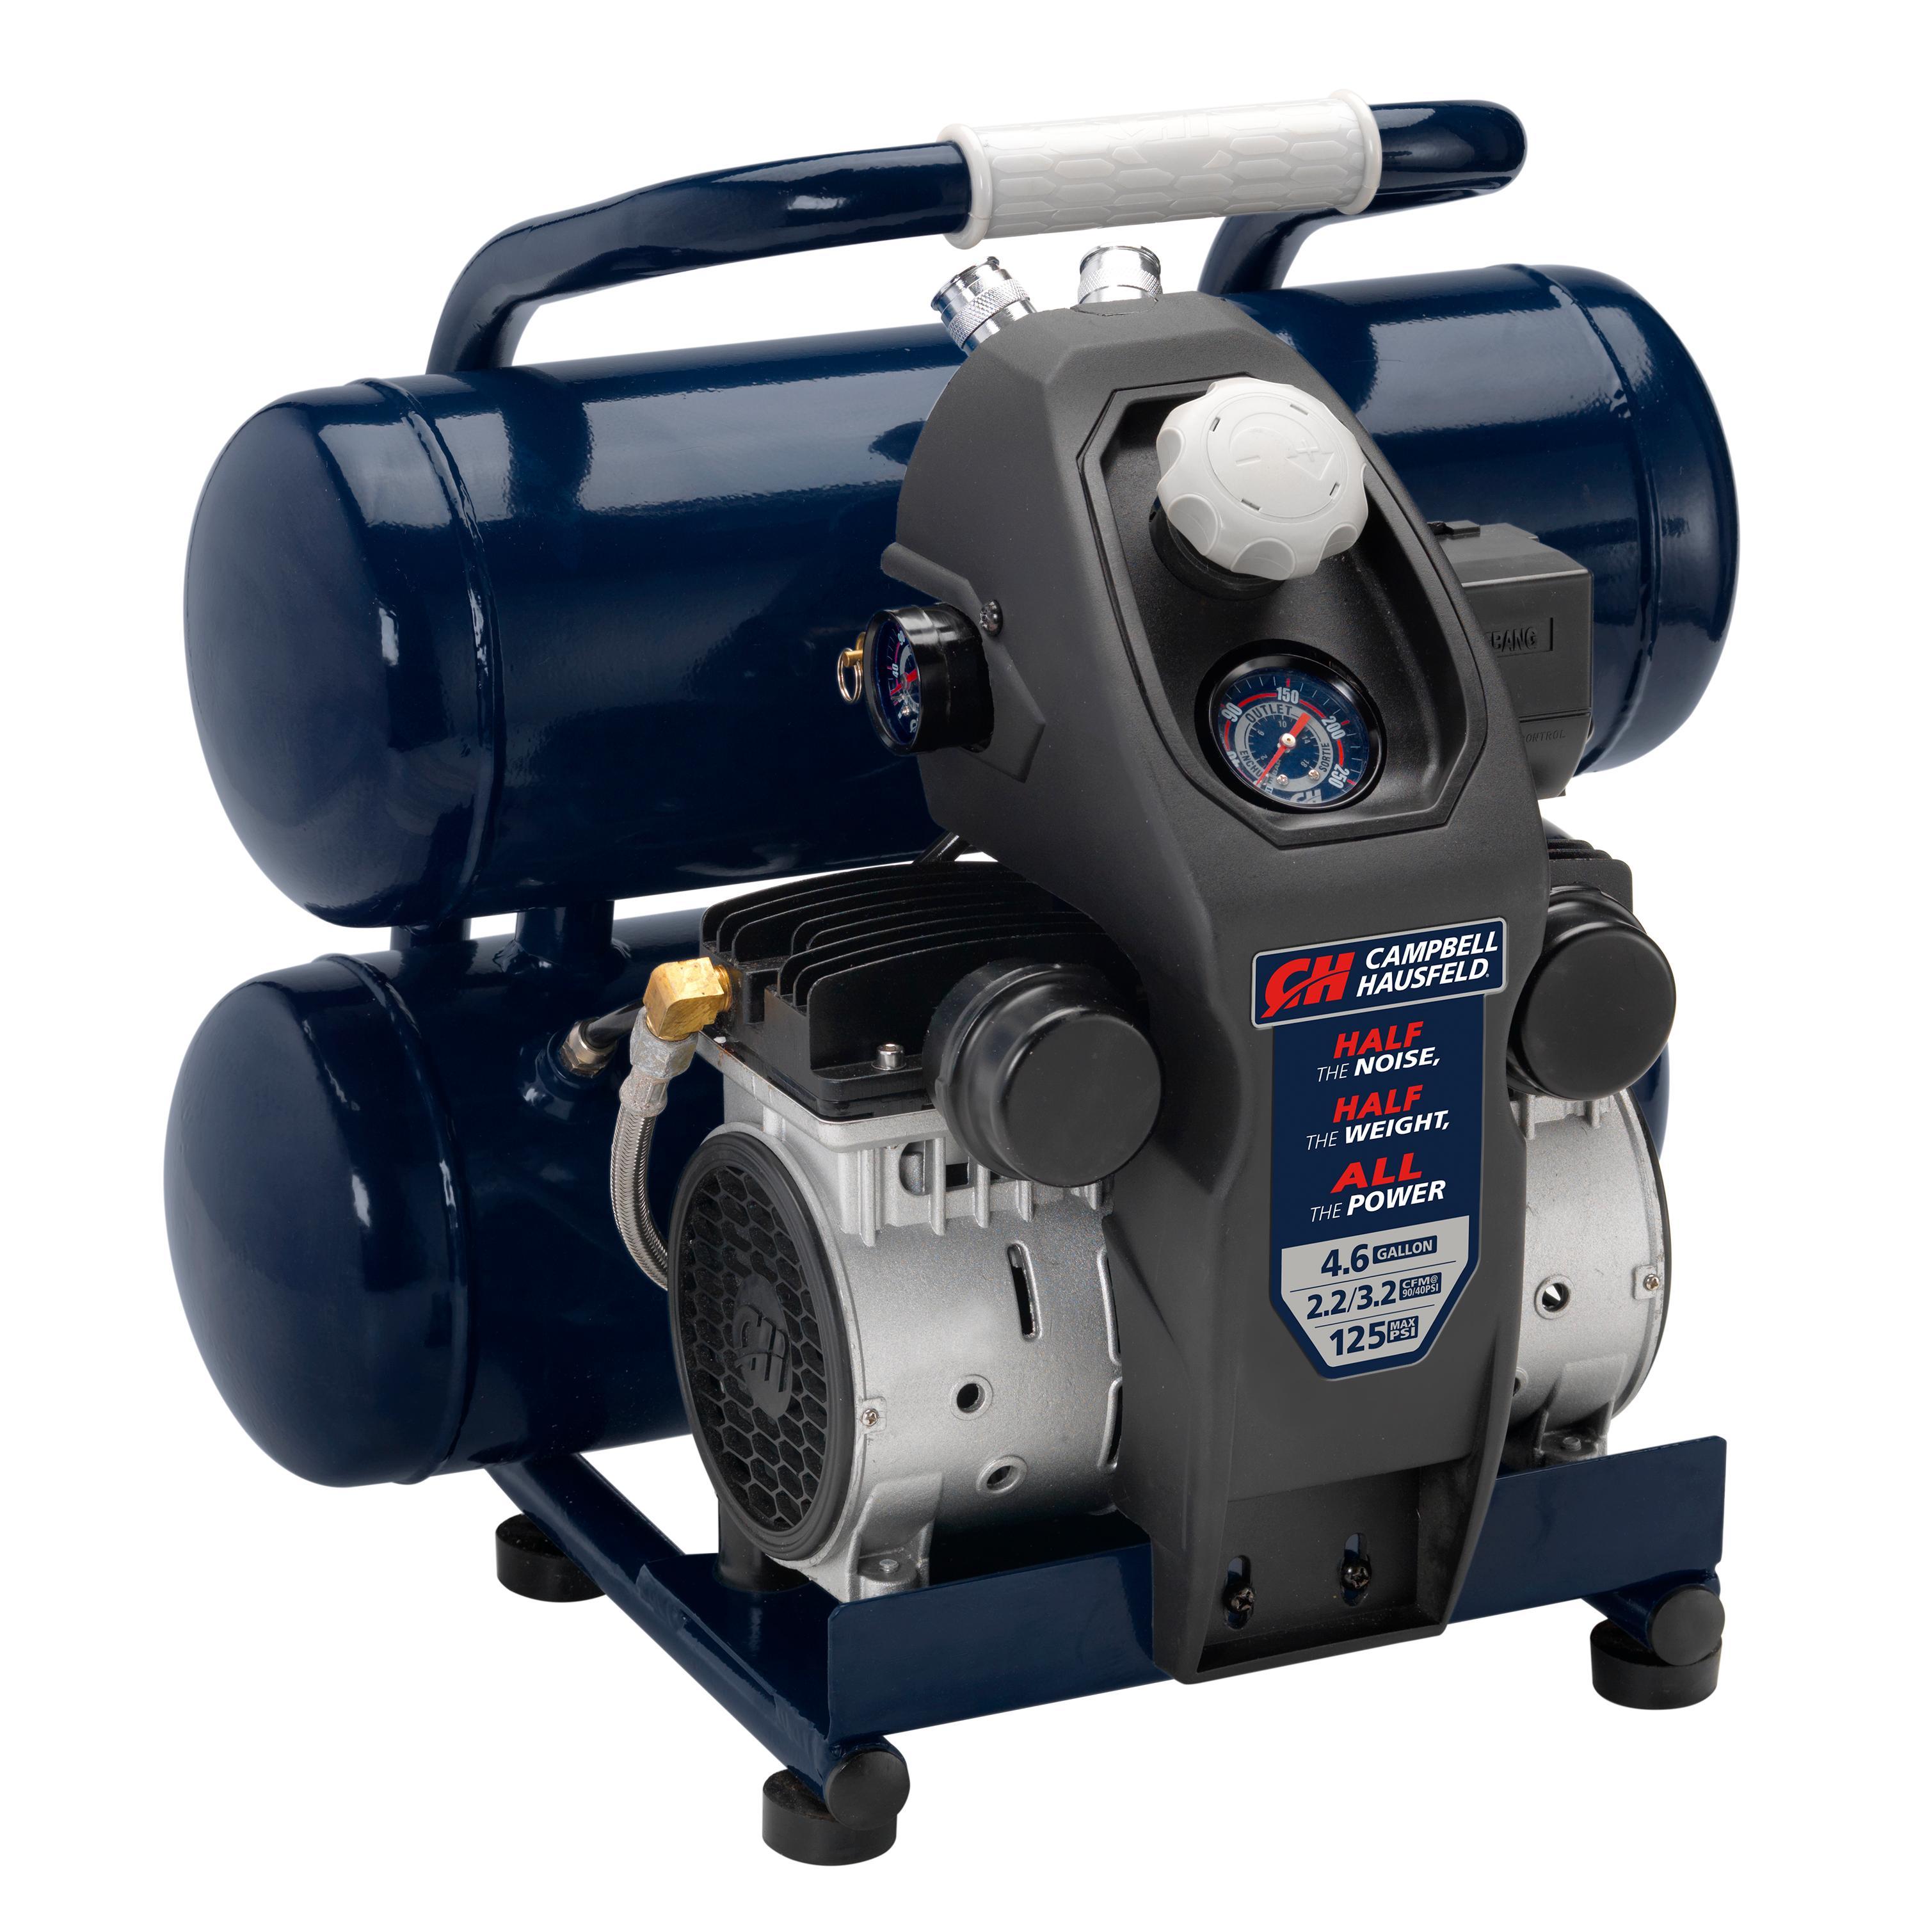 Quiet Air Compressor, Lightweight, 4.6 Gallon, Half the